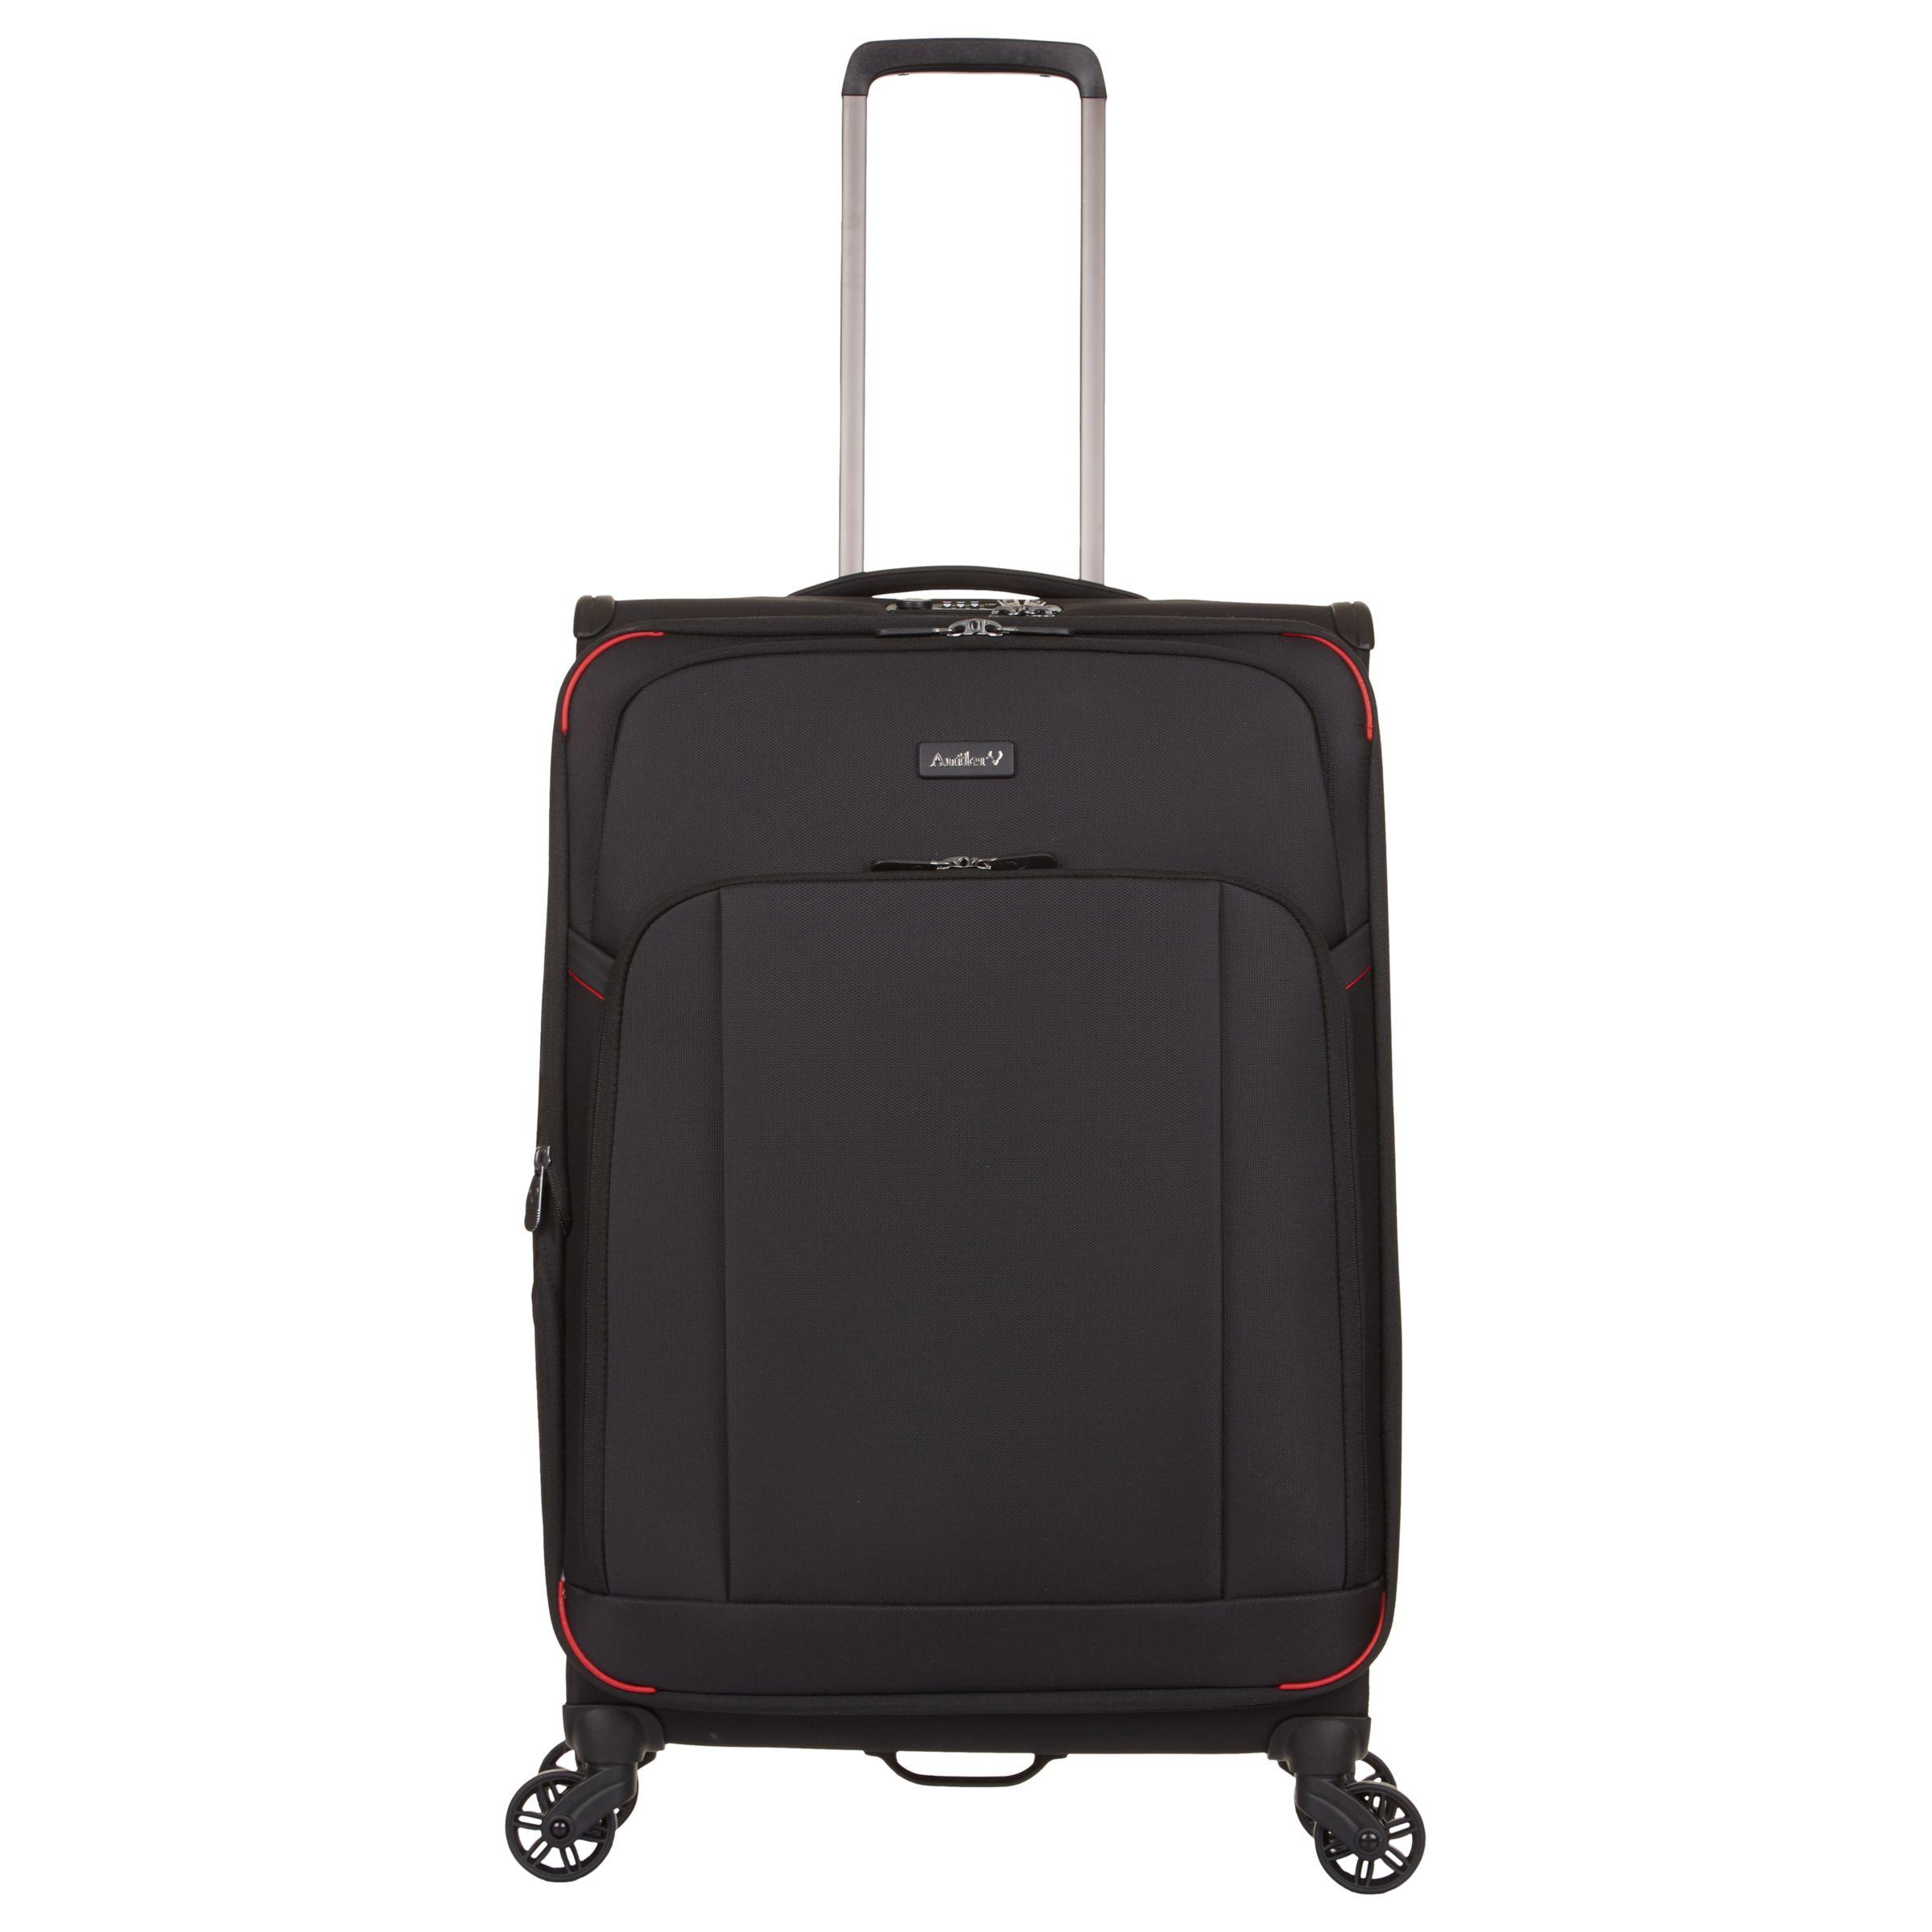 Antler Antler Atmosphere 70cm 4-Wheel Medium Suitcase